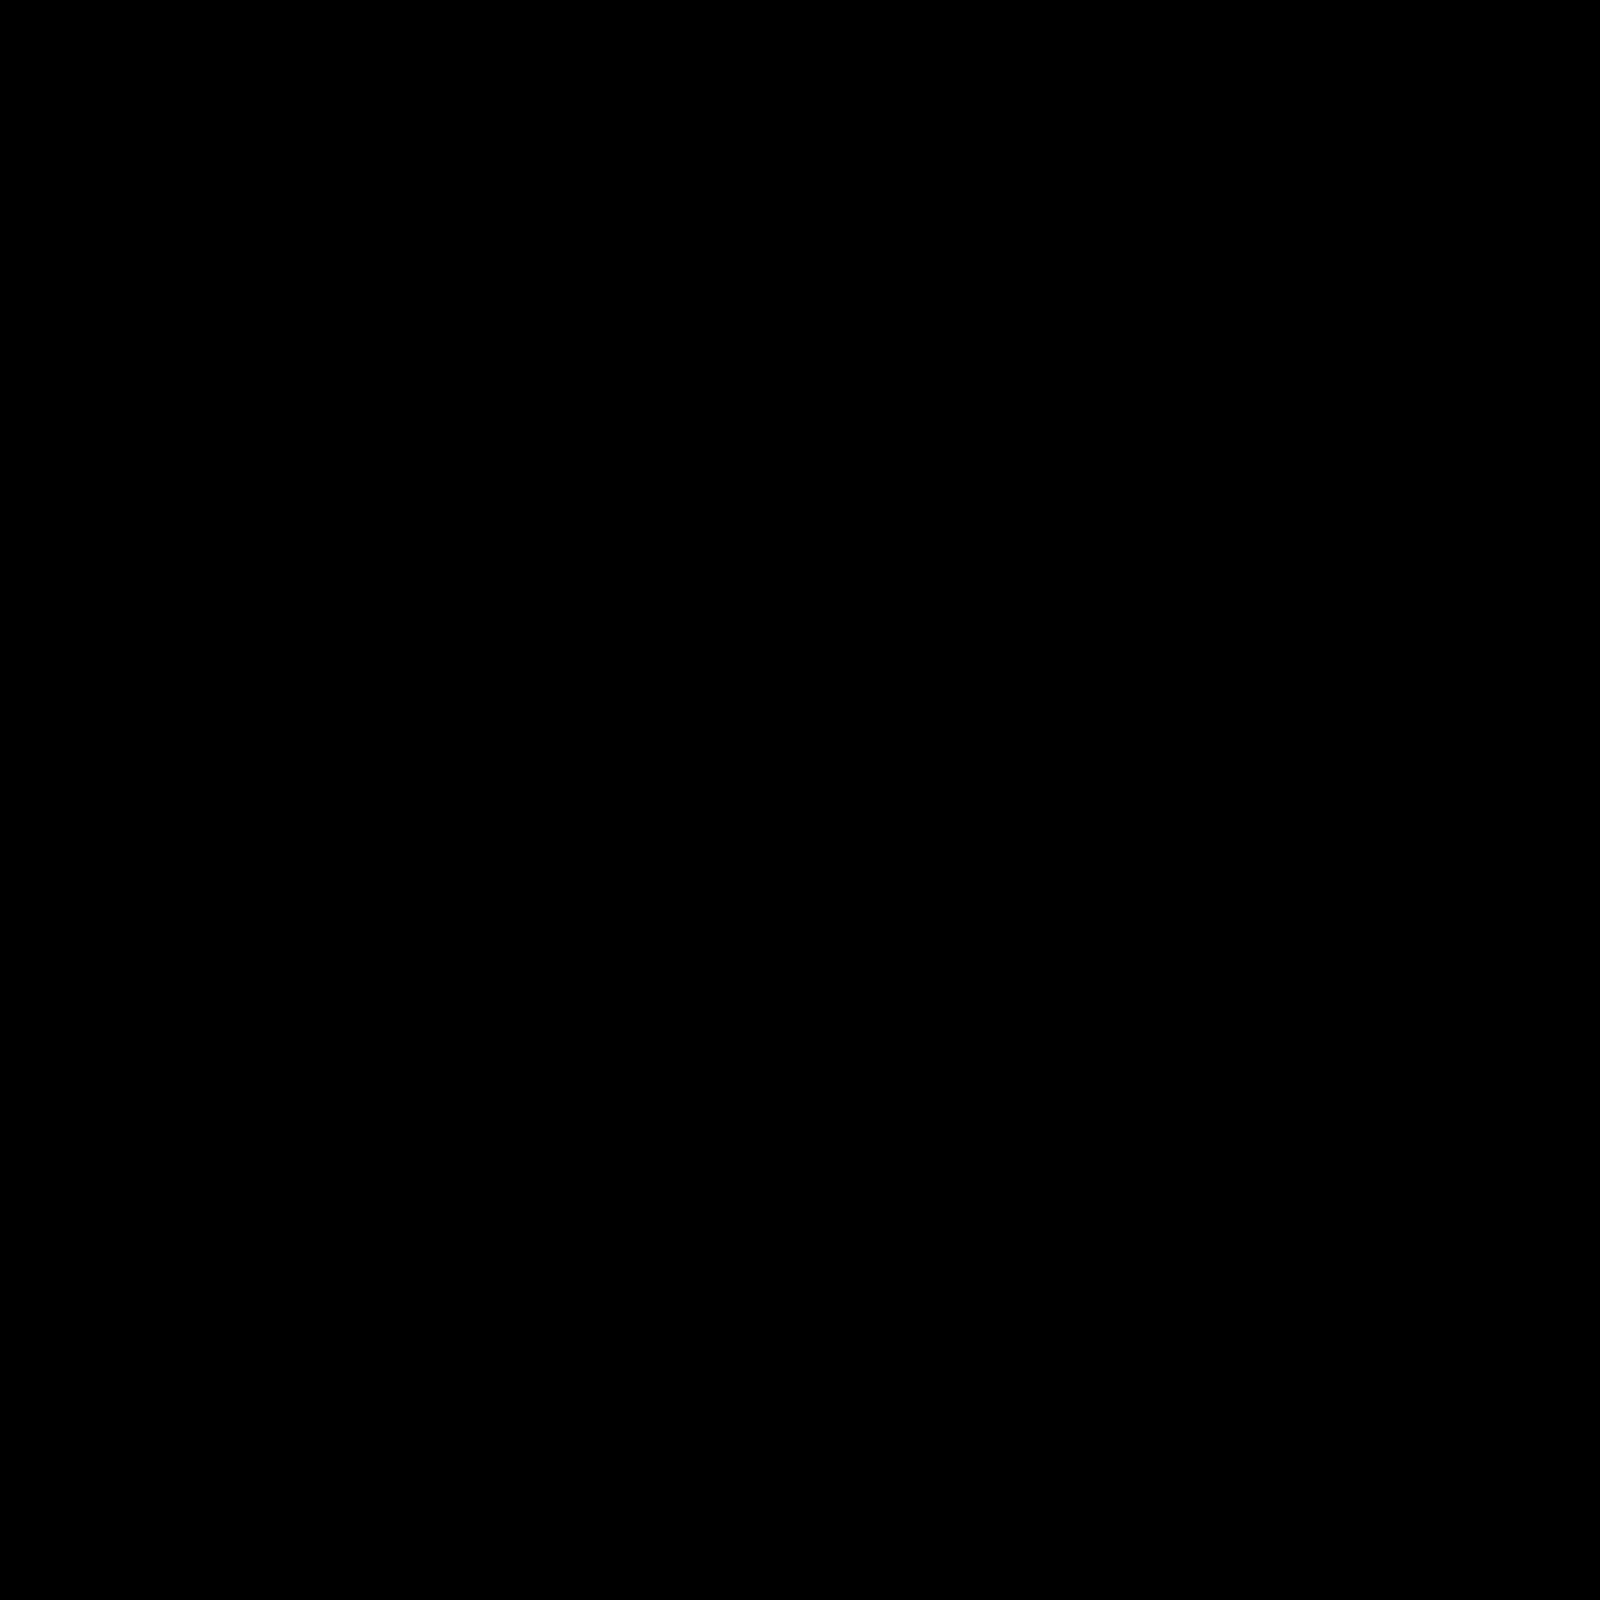 Tor kolarski icon